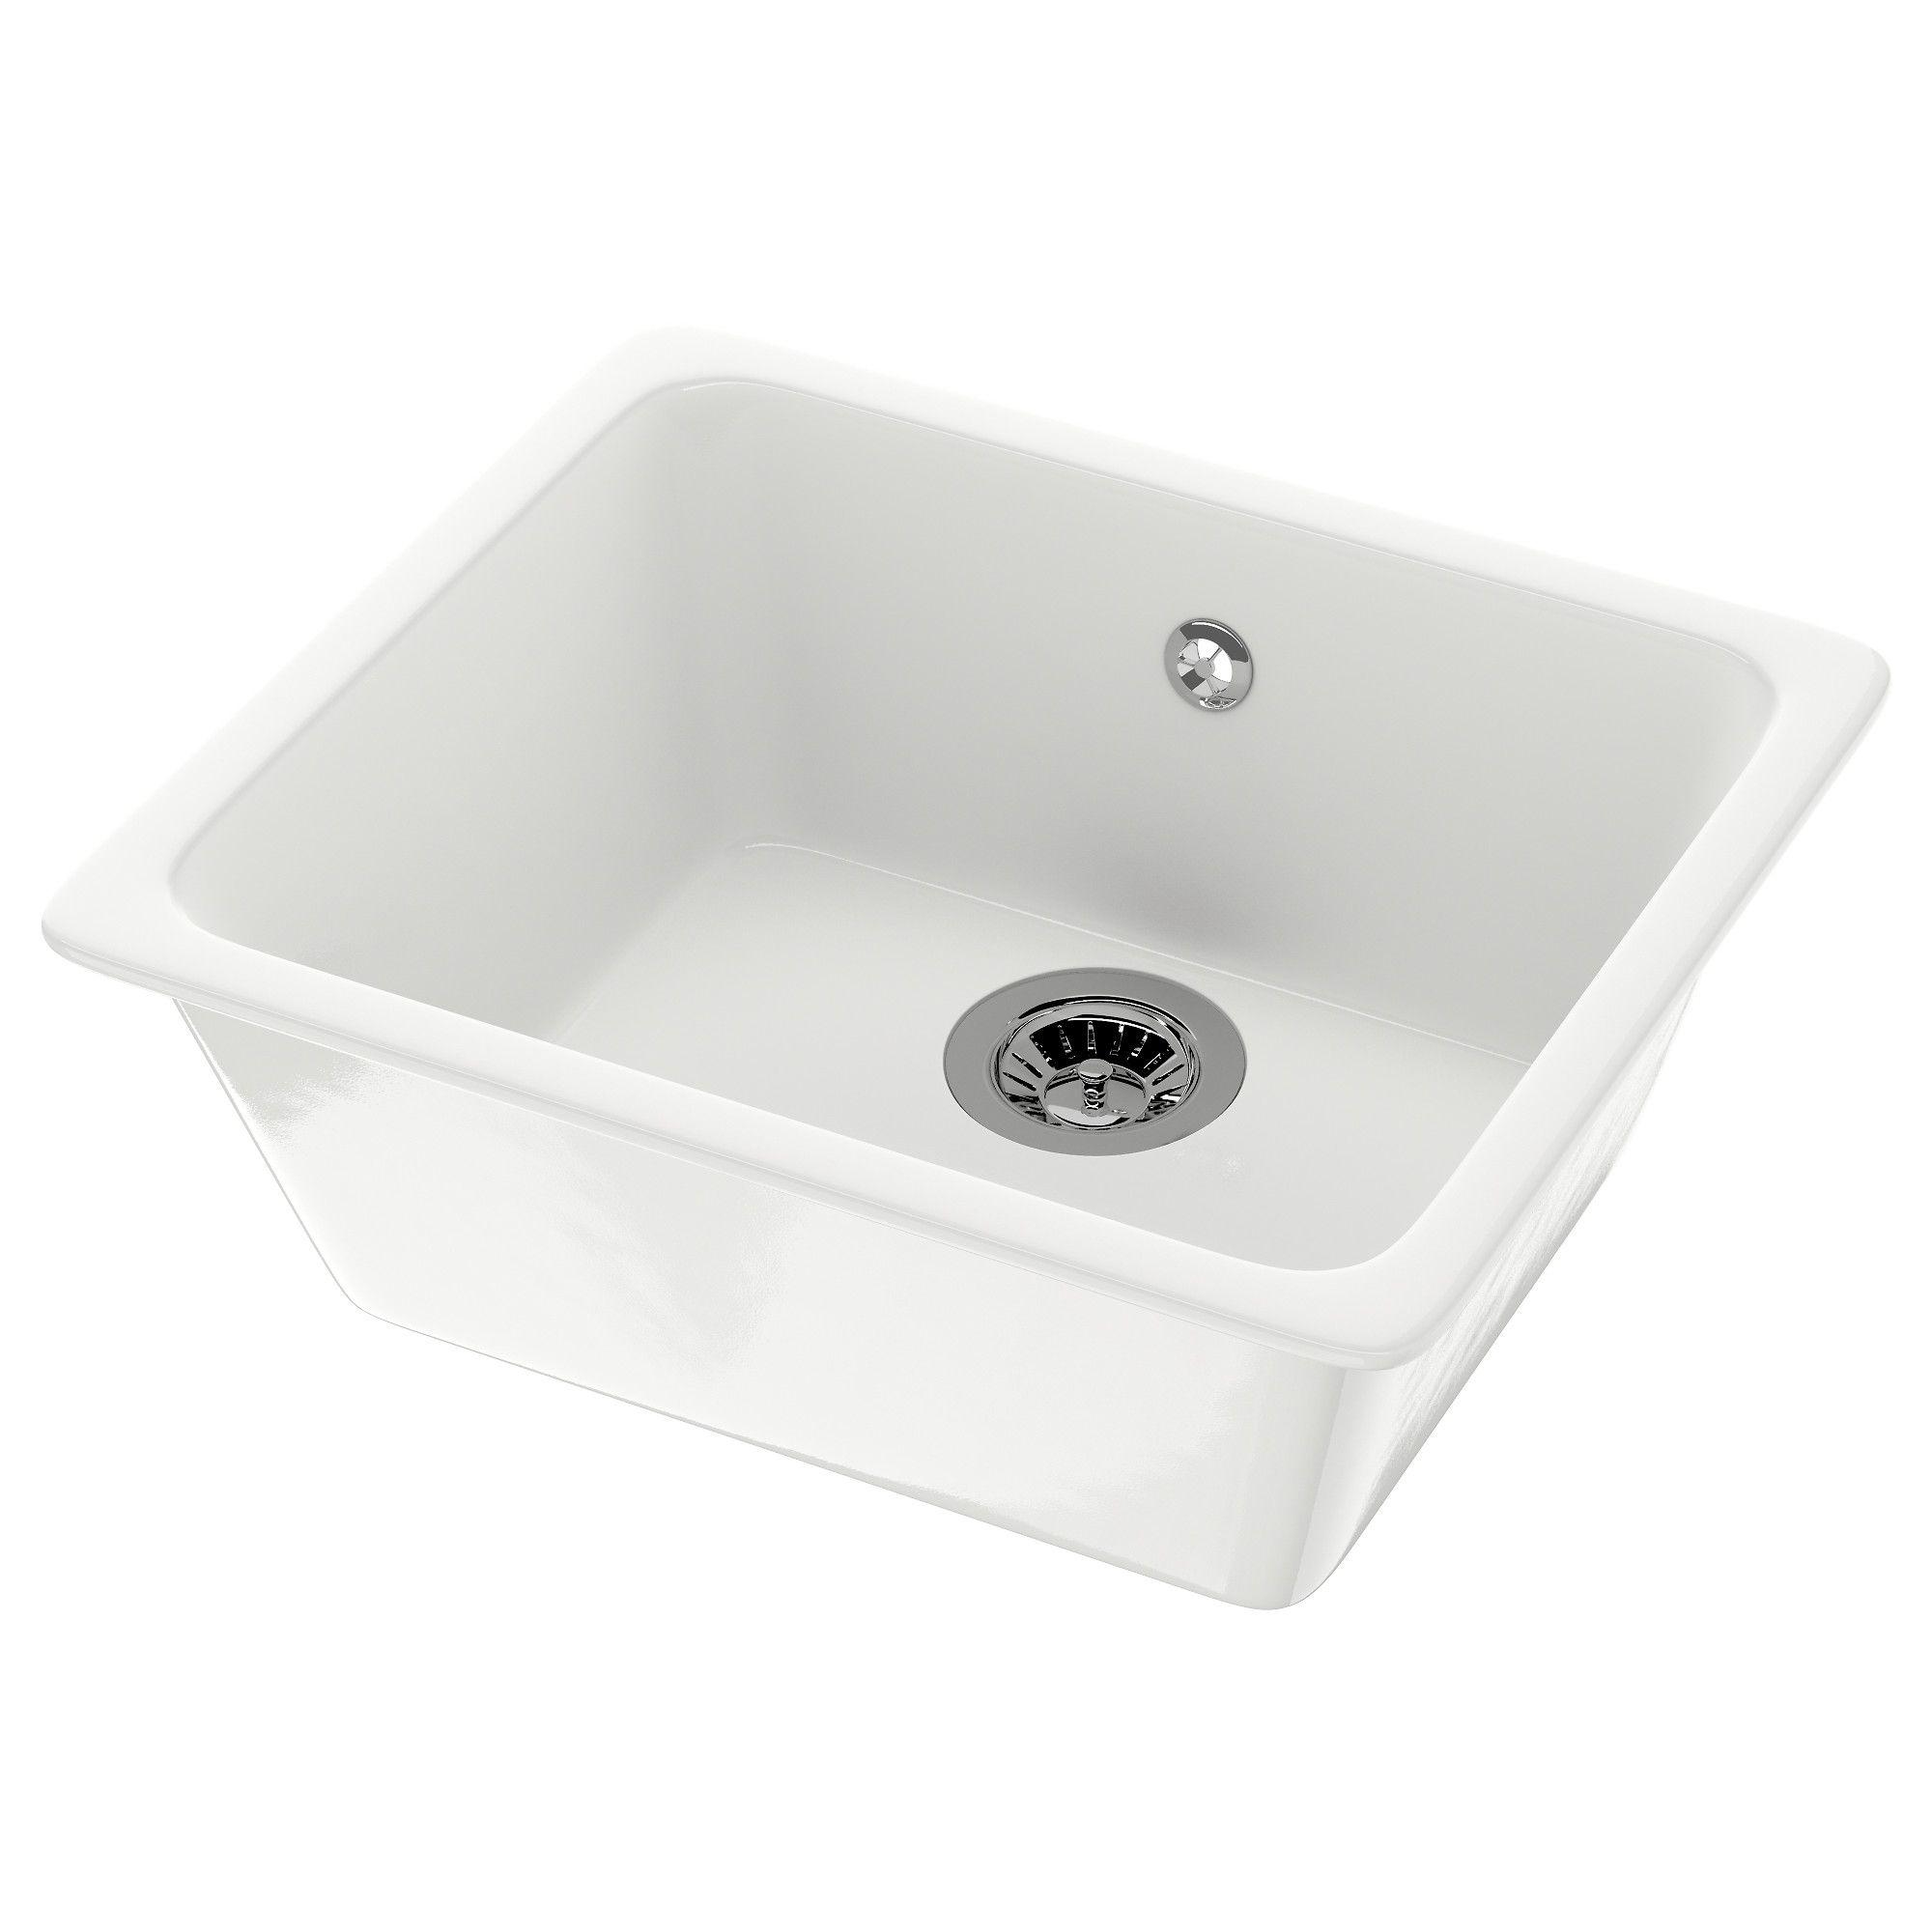 Becken Waschküche ikea domsjö single bowl inset sink 25 year guarantee read about